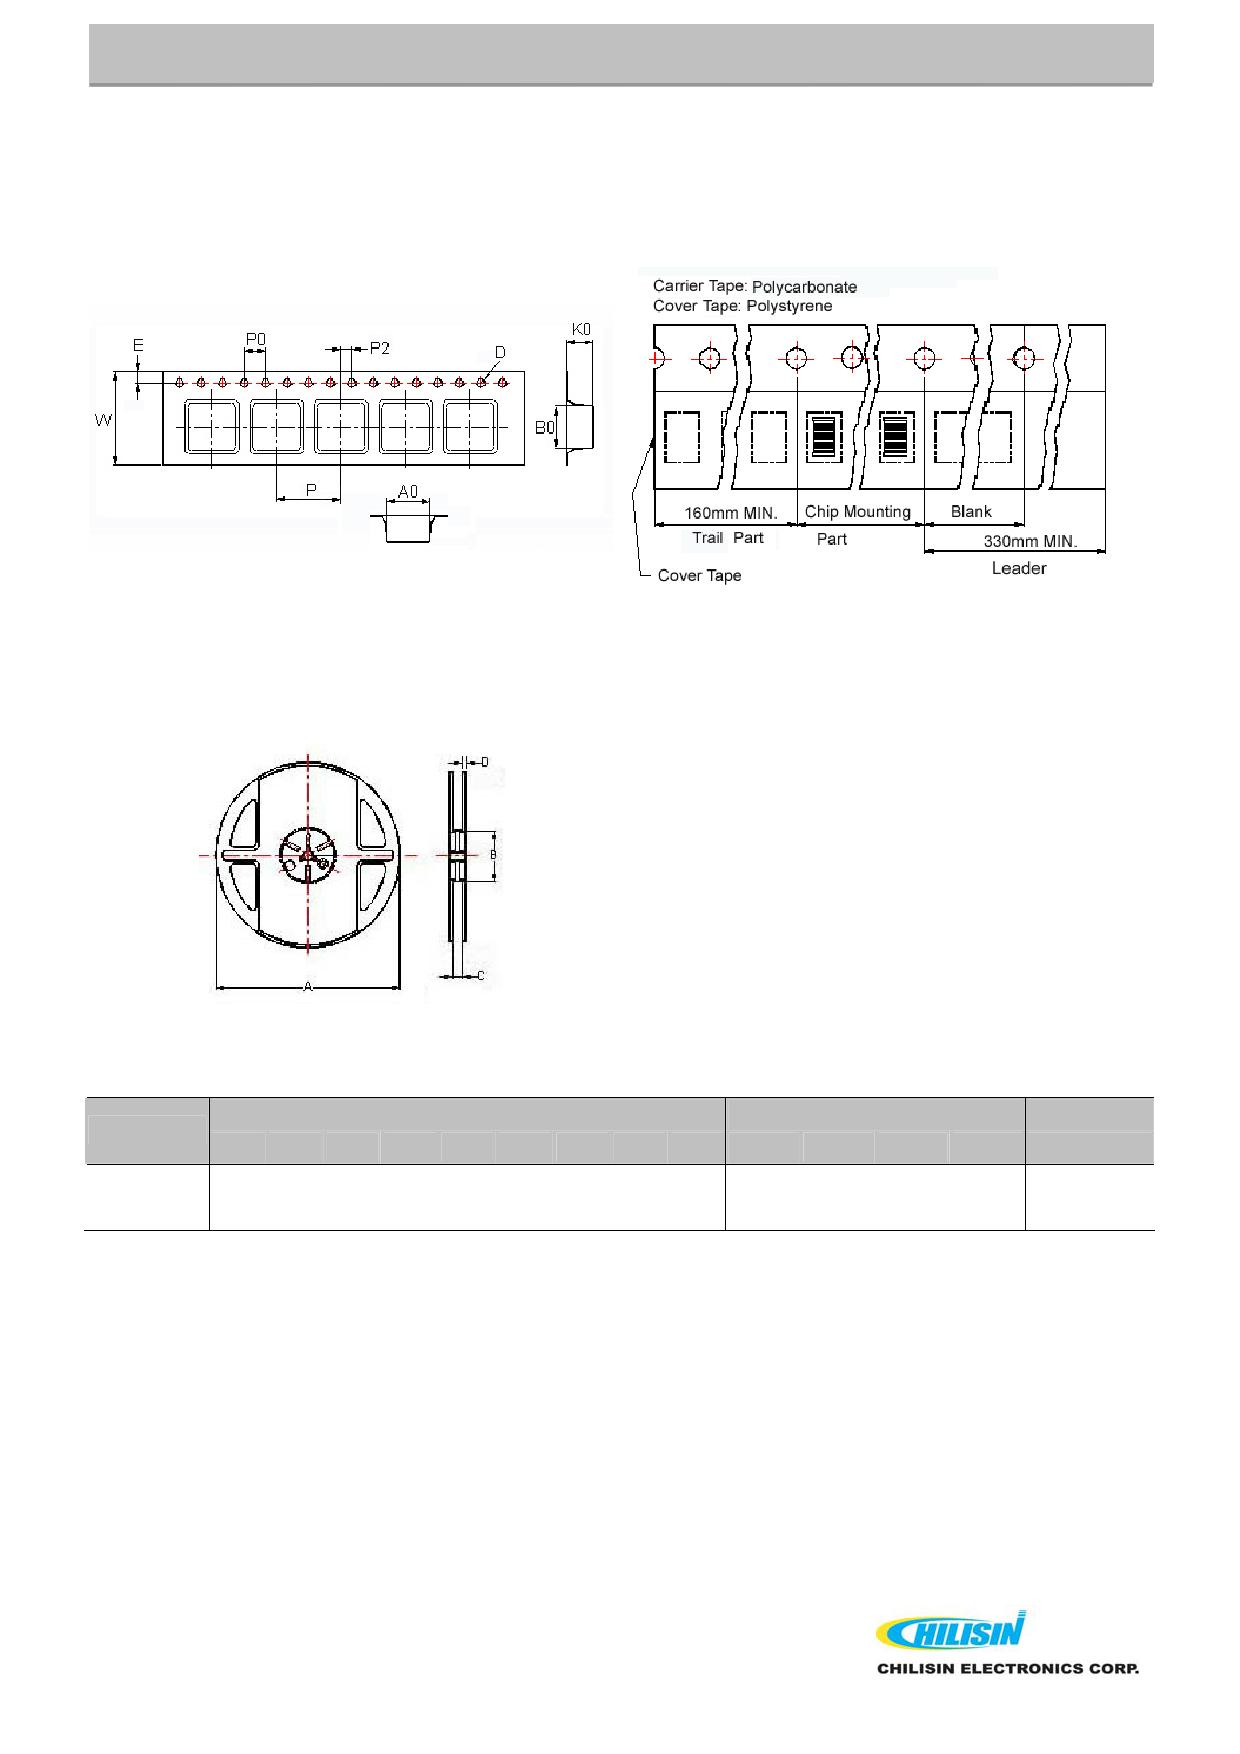 SQV322520 pdf, 반도체, 판매, 대치품